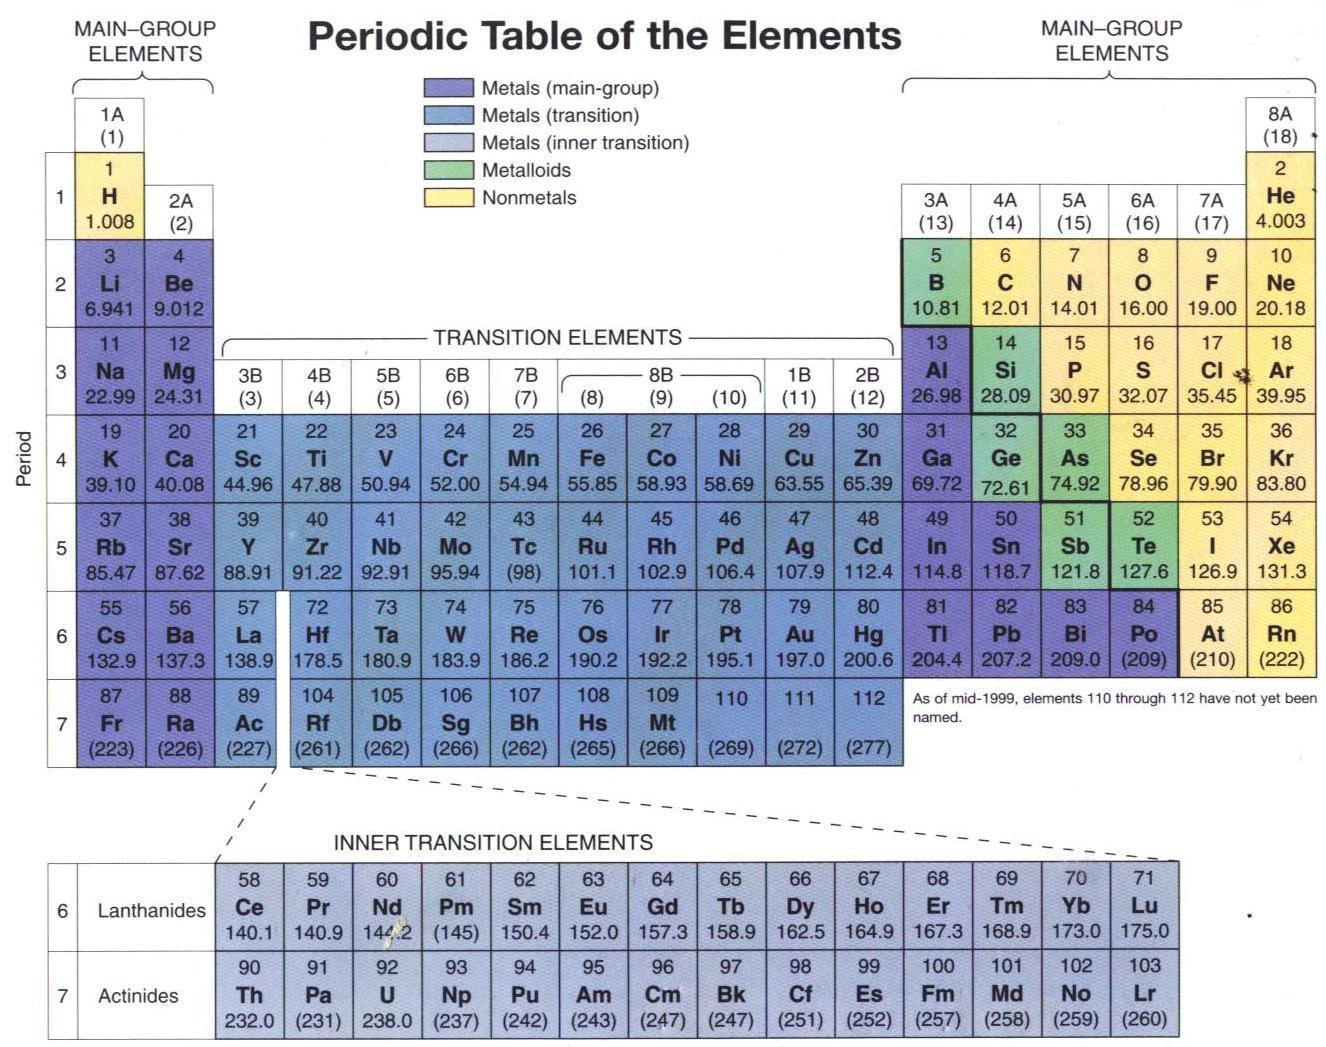 Nkillz tabel periodik link download hd image http2bpspotvlwq6cpj4stfgwf5vjwiaaaaaaaaadyuetumwbws1600 tabel periodik fullg urtaz Choice Image